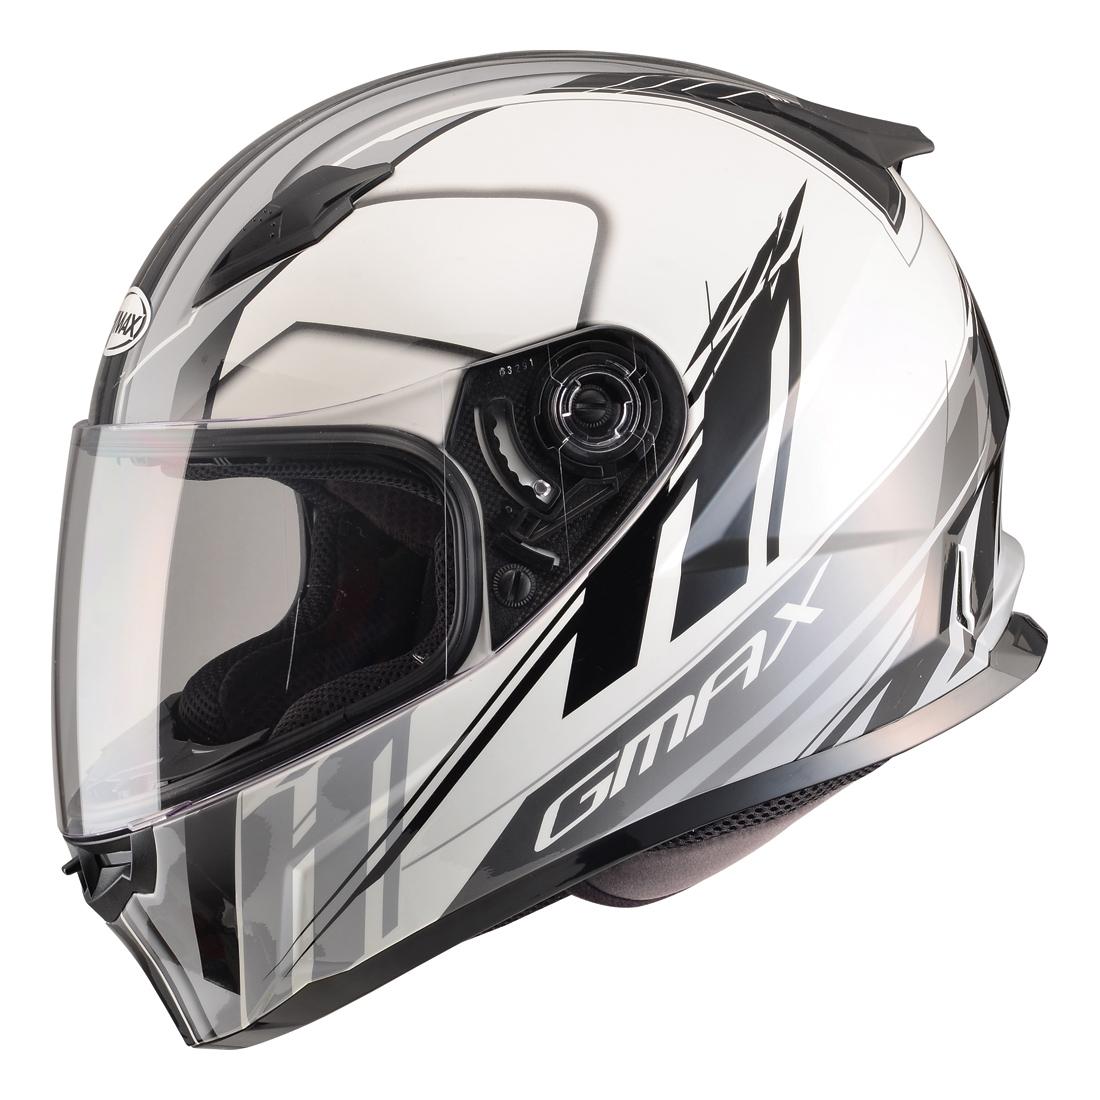 GMAX FF49 Rogue White/Black Full Face Helmet